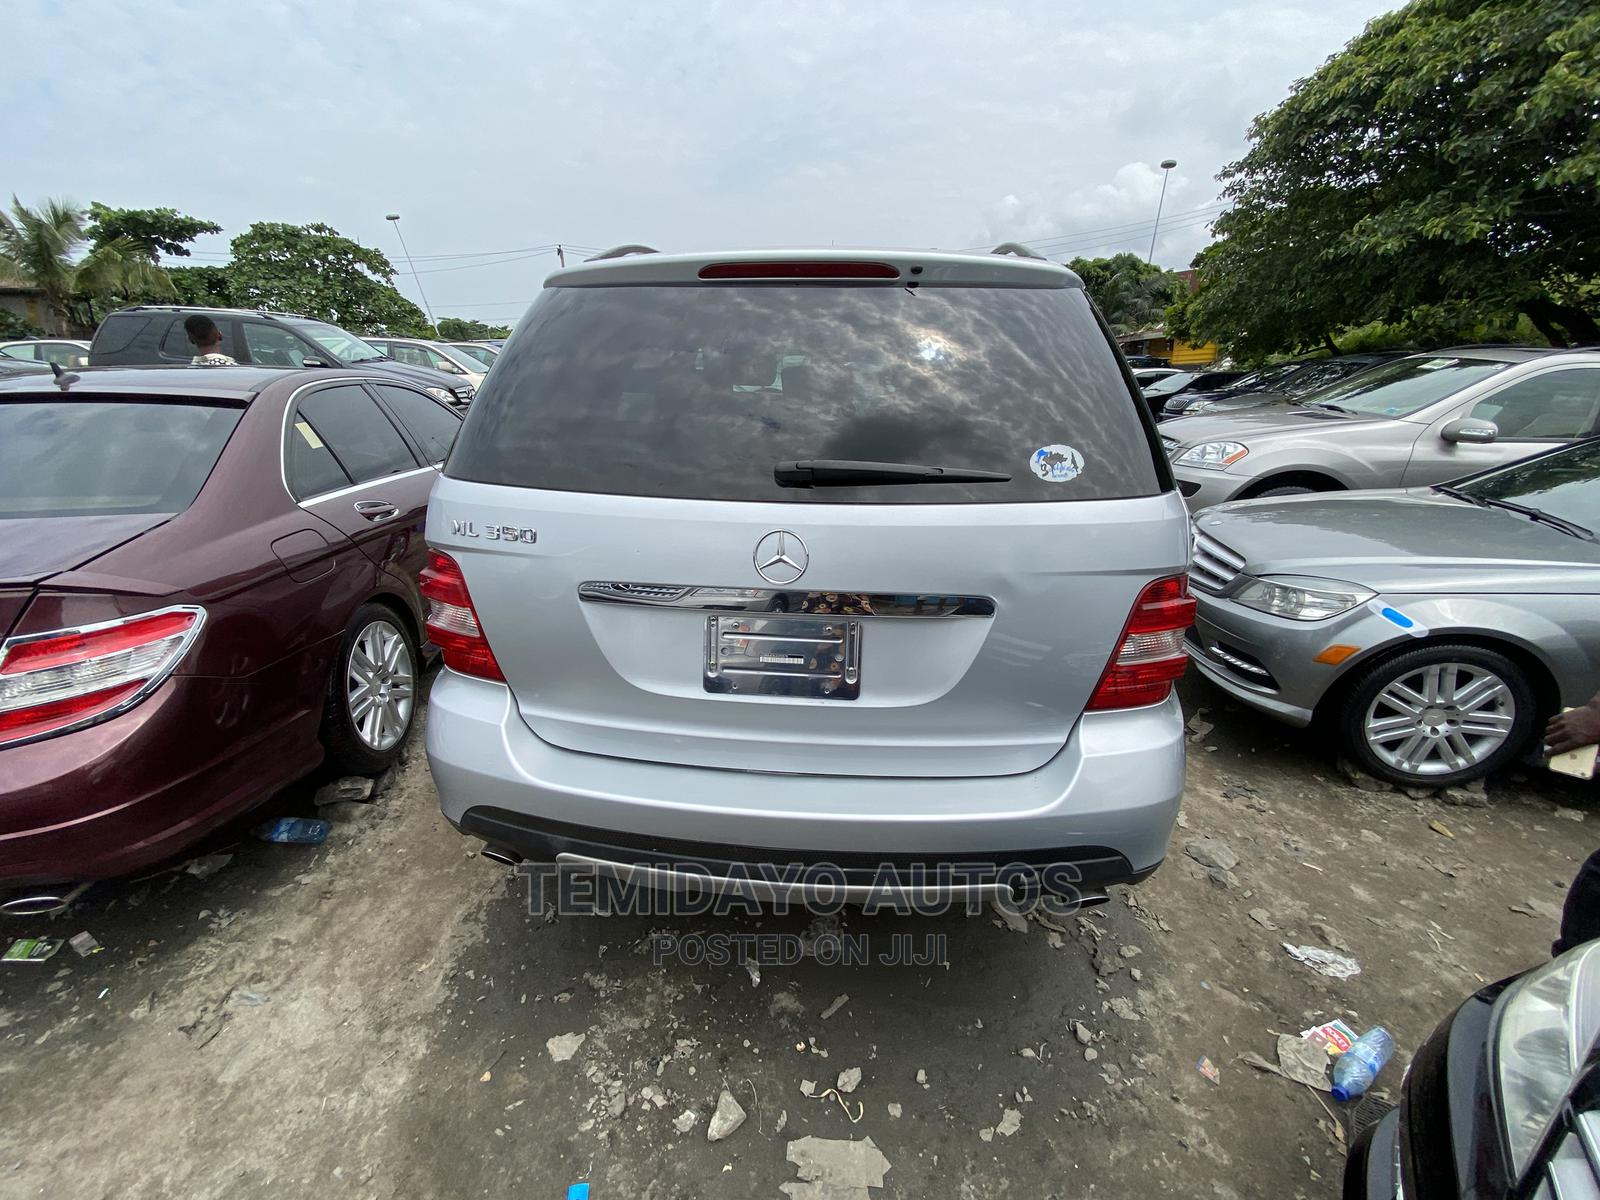 Mercedes-Benz M Class 2007 ML 350 4Matic Silver   Cars for sale in Apapa, Lagos State, Nigeria